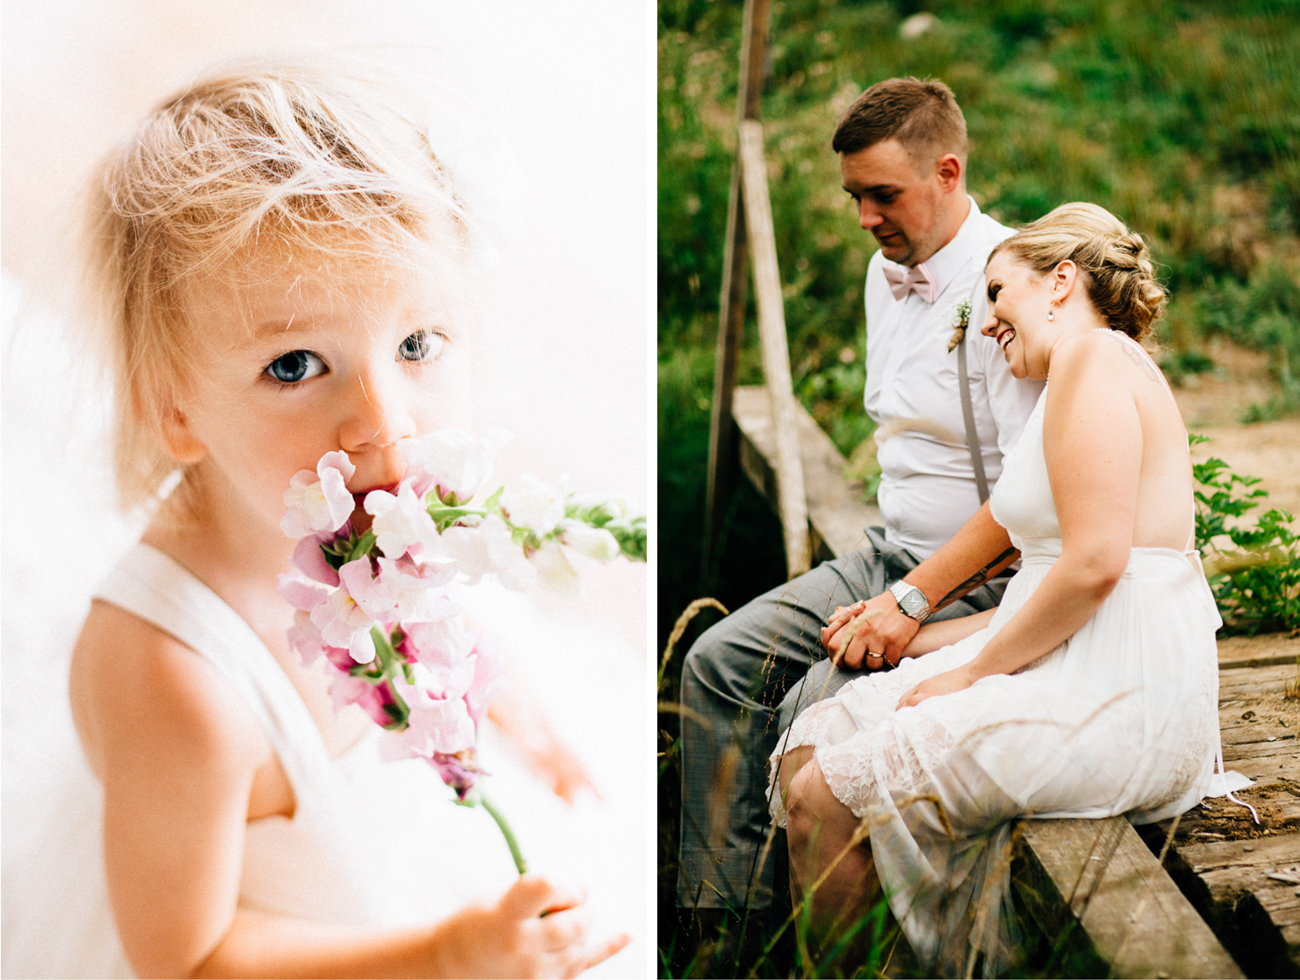 Vancouver Family Photographer - Emmy Lou Virginia Photography-54.jpg